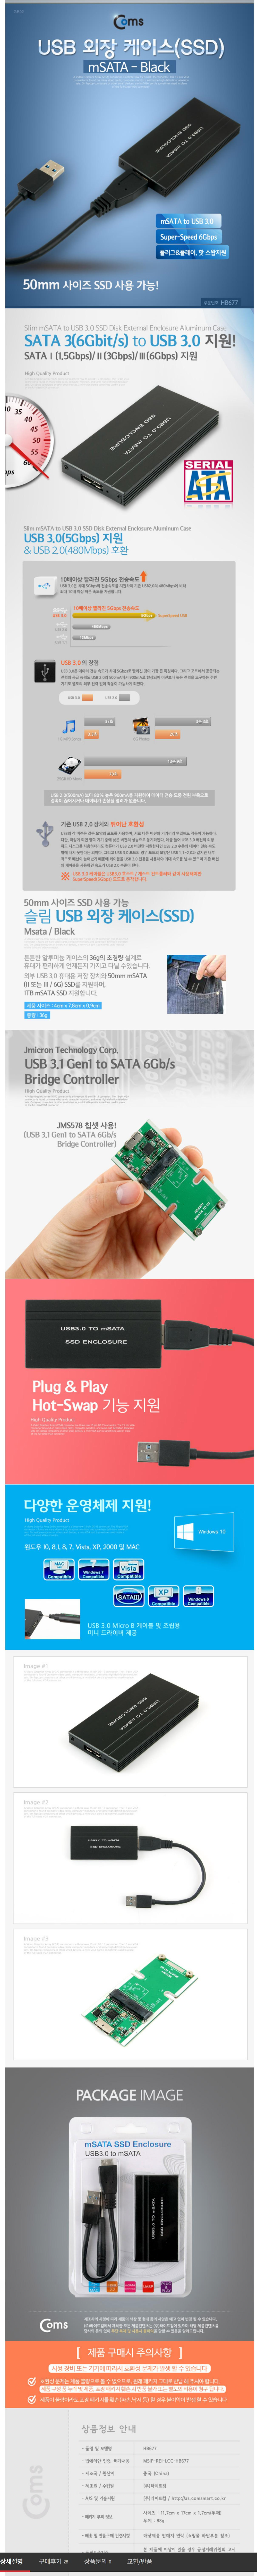 Screenshot_2020-03-14 (Coms) USB 외장 케이스 SSD (Msata) 저장장치 HB677 - 옥션.jpg